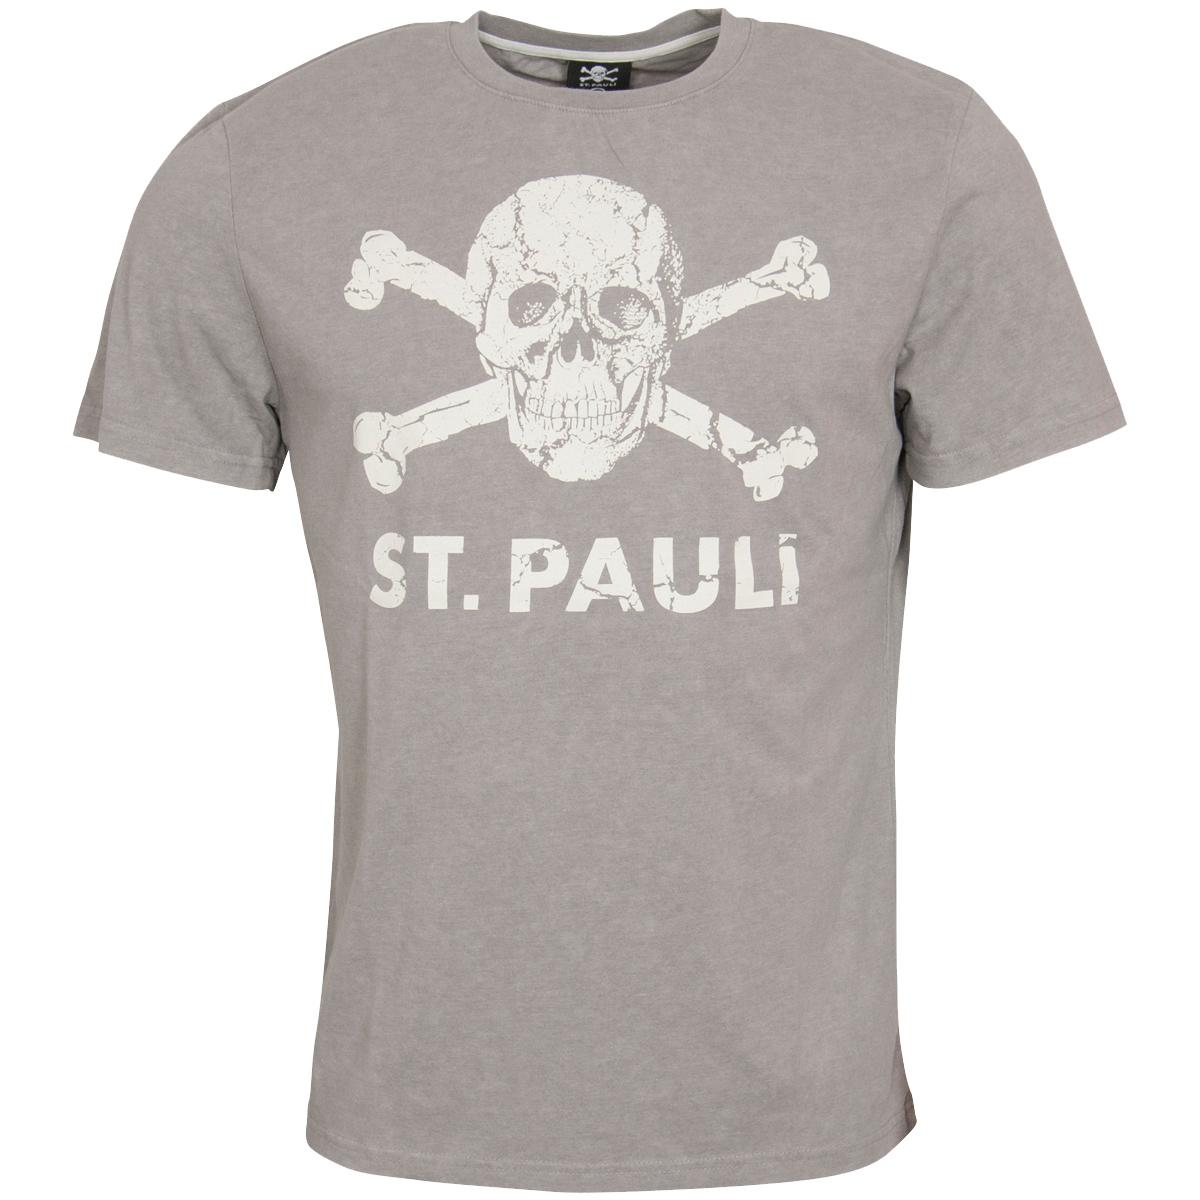 FC St. Pauli - T-Shirt Totenkopf Brushed Grey - grau